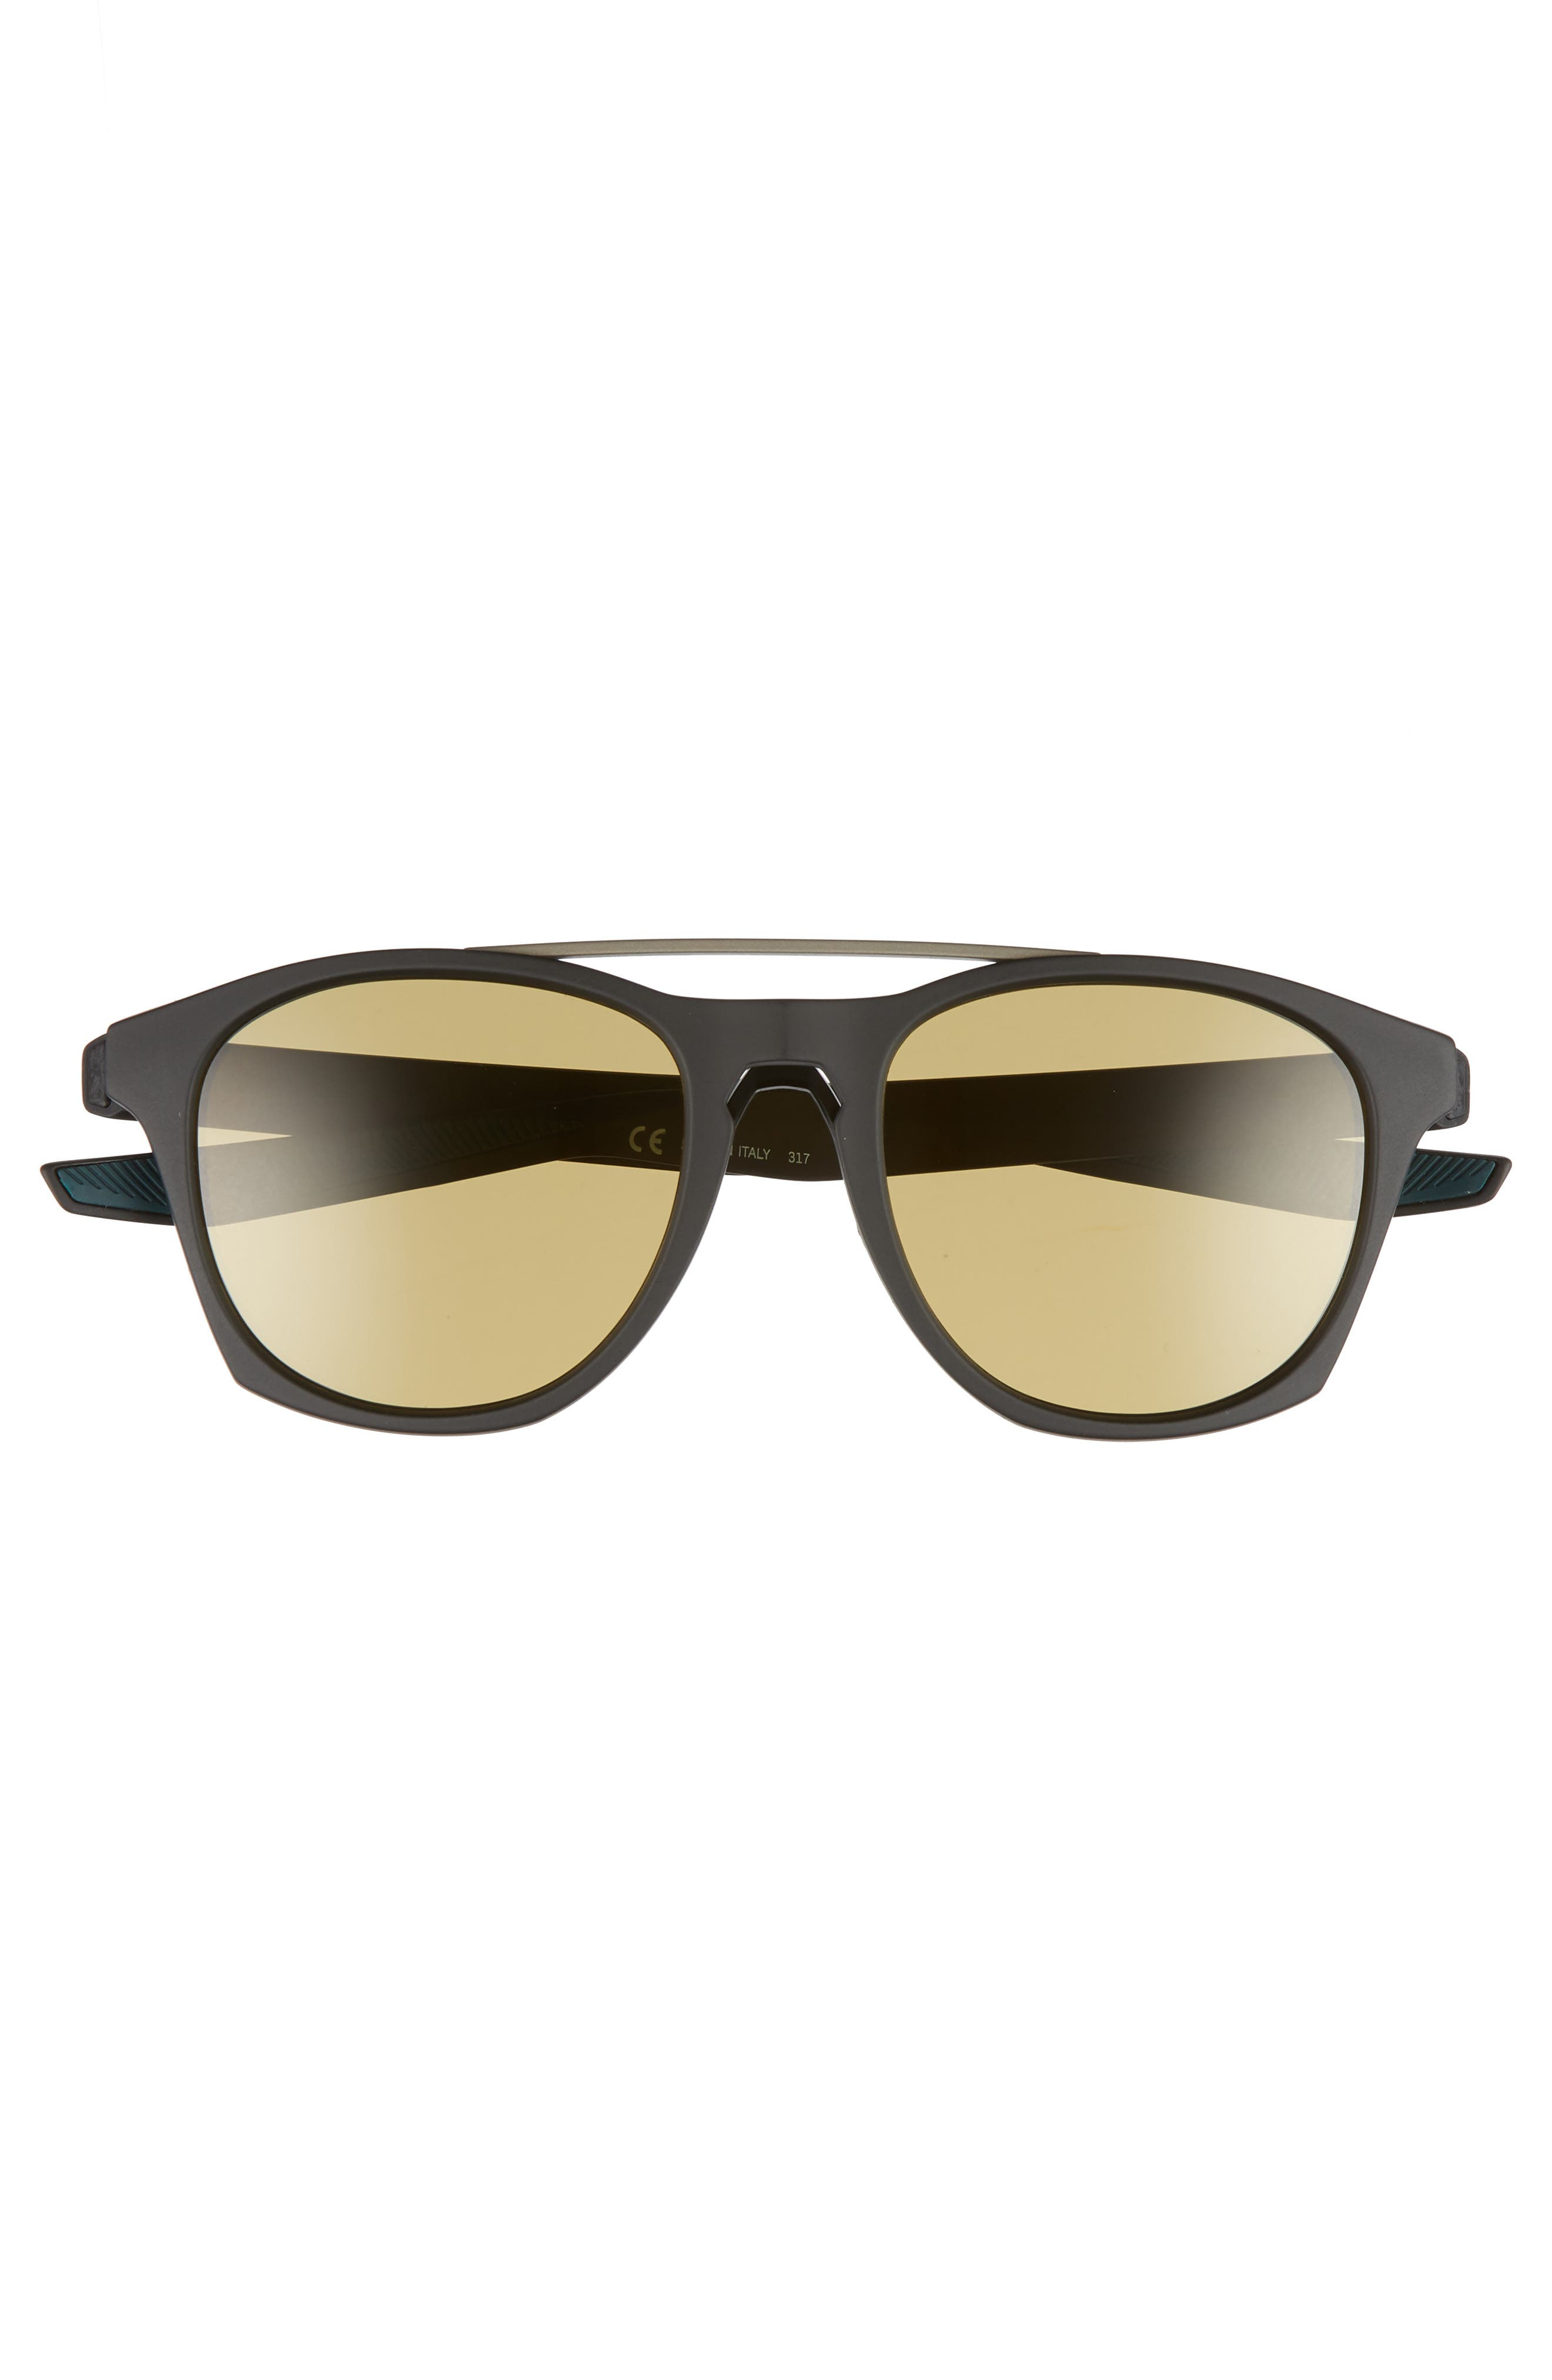 Current 51mm Sunglasses,                             Alternate thumbnail 2, color,                             MATTE BLACK/ PEWTER/ AMBER